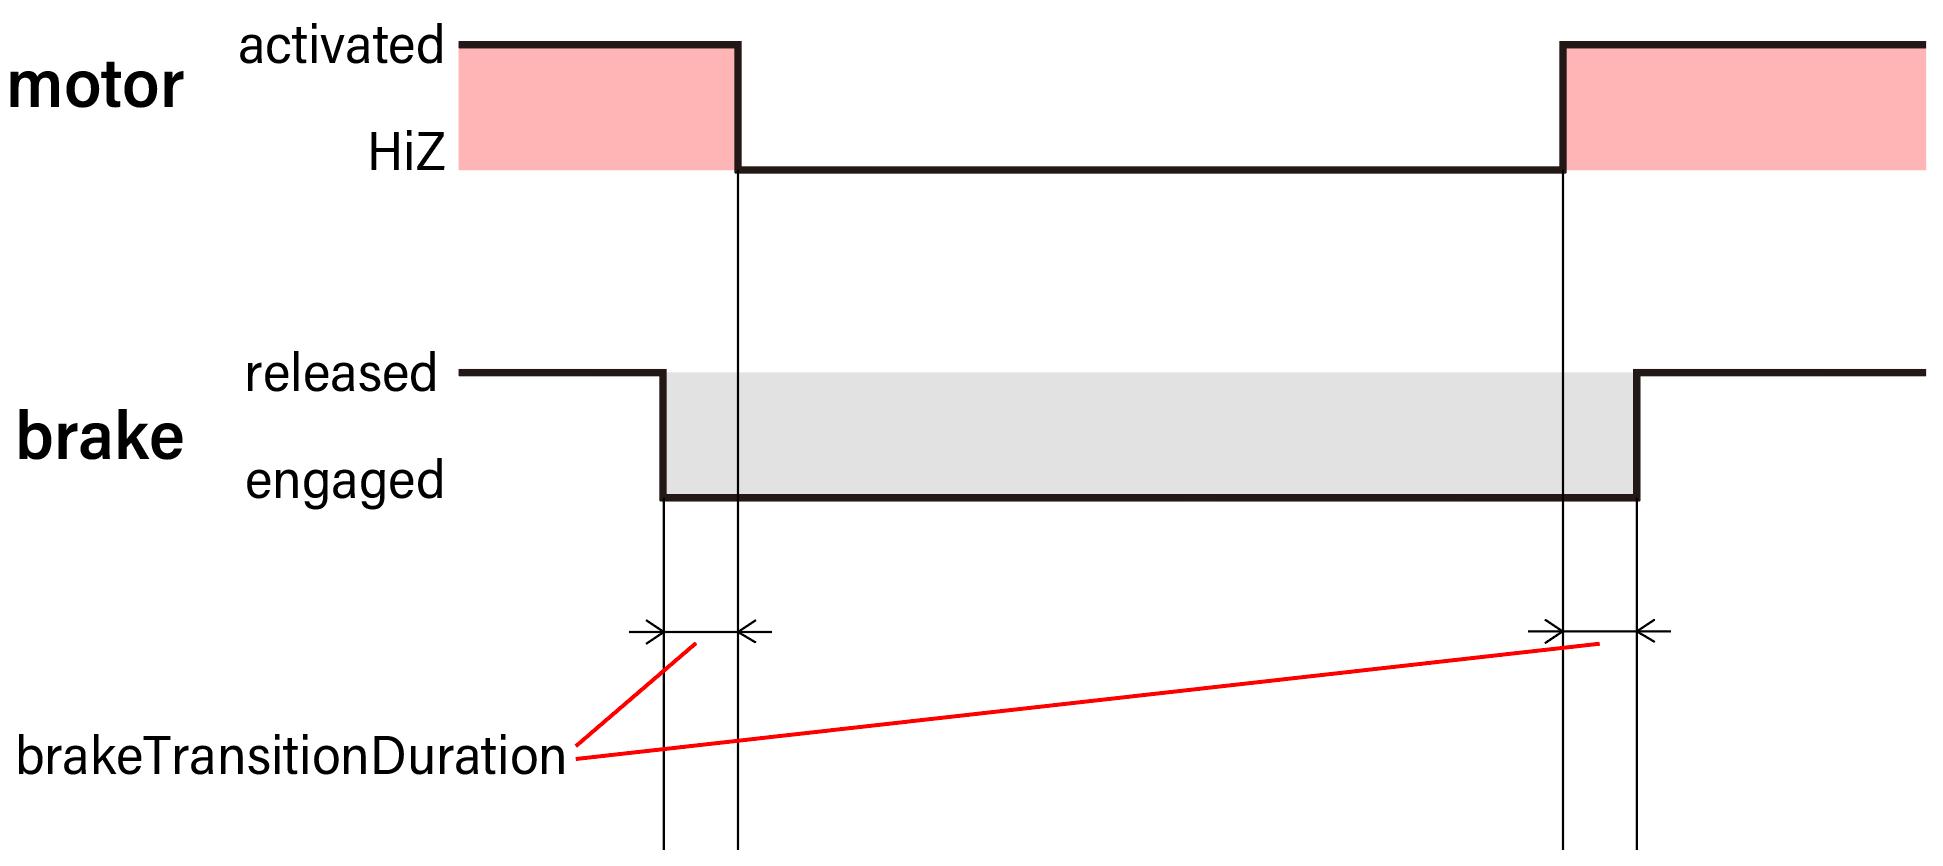 Brake Transition Duration